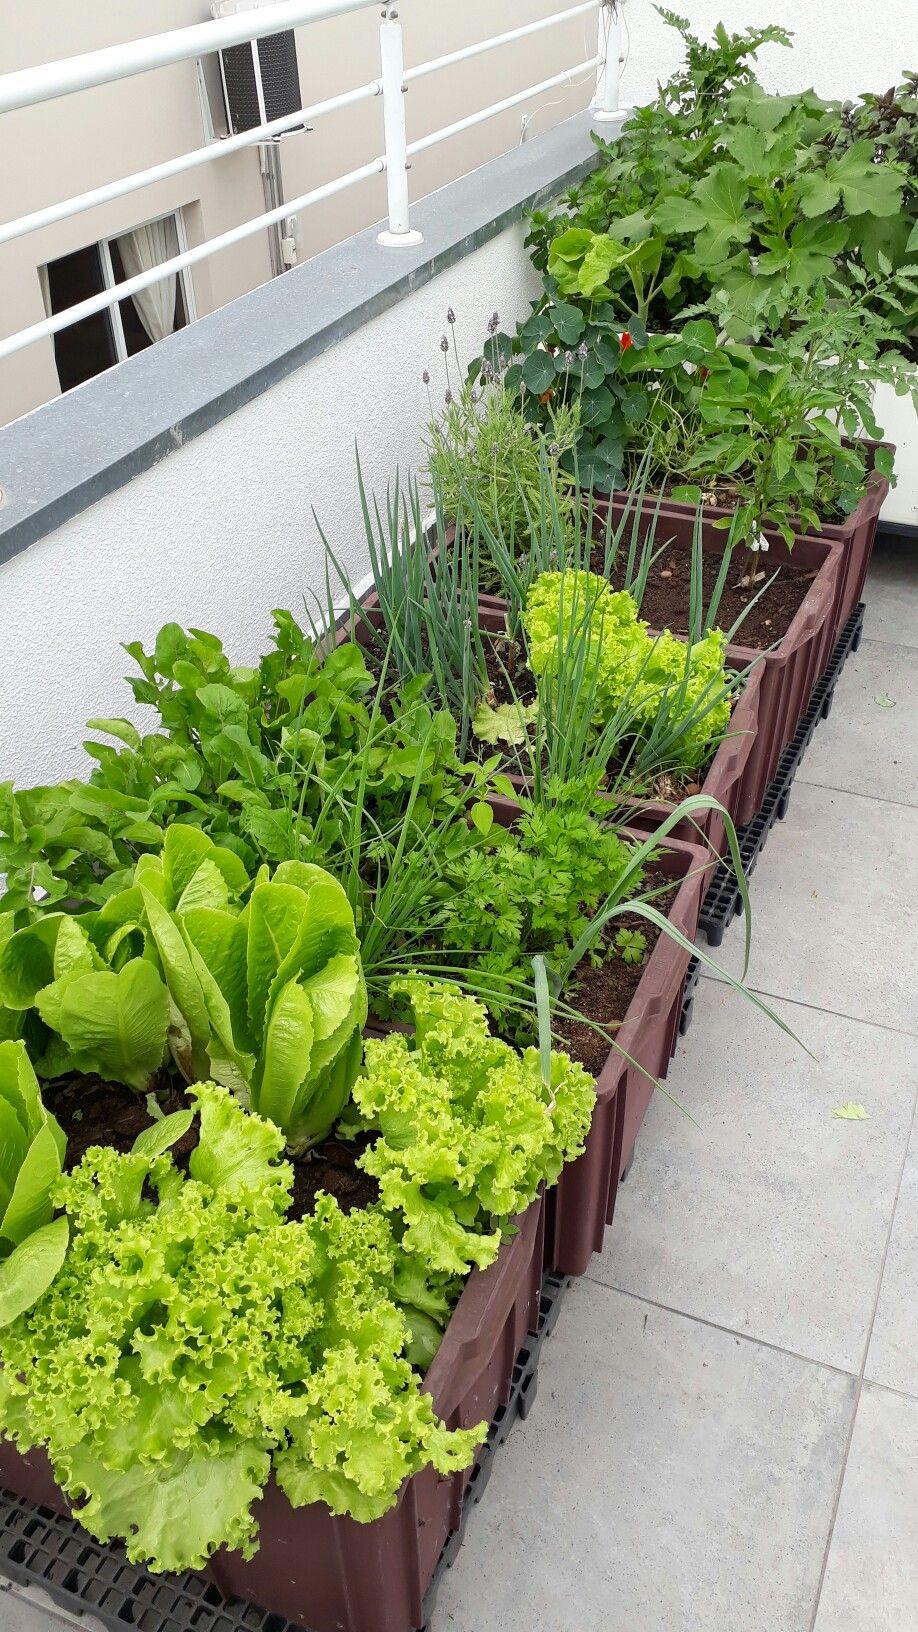 Horta em pequenos espaços. #studiomsdesign #horta #hortaemcasa #hortaemsacada #verduras #legumes #temperos #ervas Projekty Zeleninových Zahrad, Jedlá Zahrada, Bylinková Zahrada, Ovocná Zahrada, Vzhled Bylinkové Zahrádky